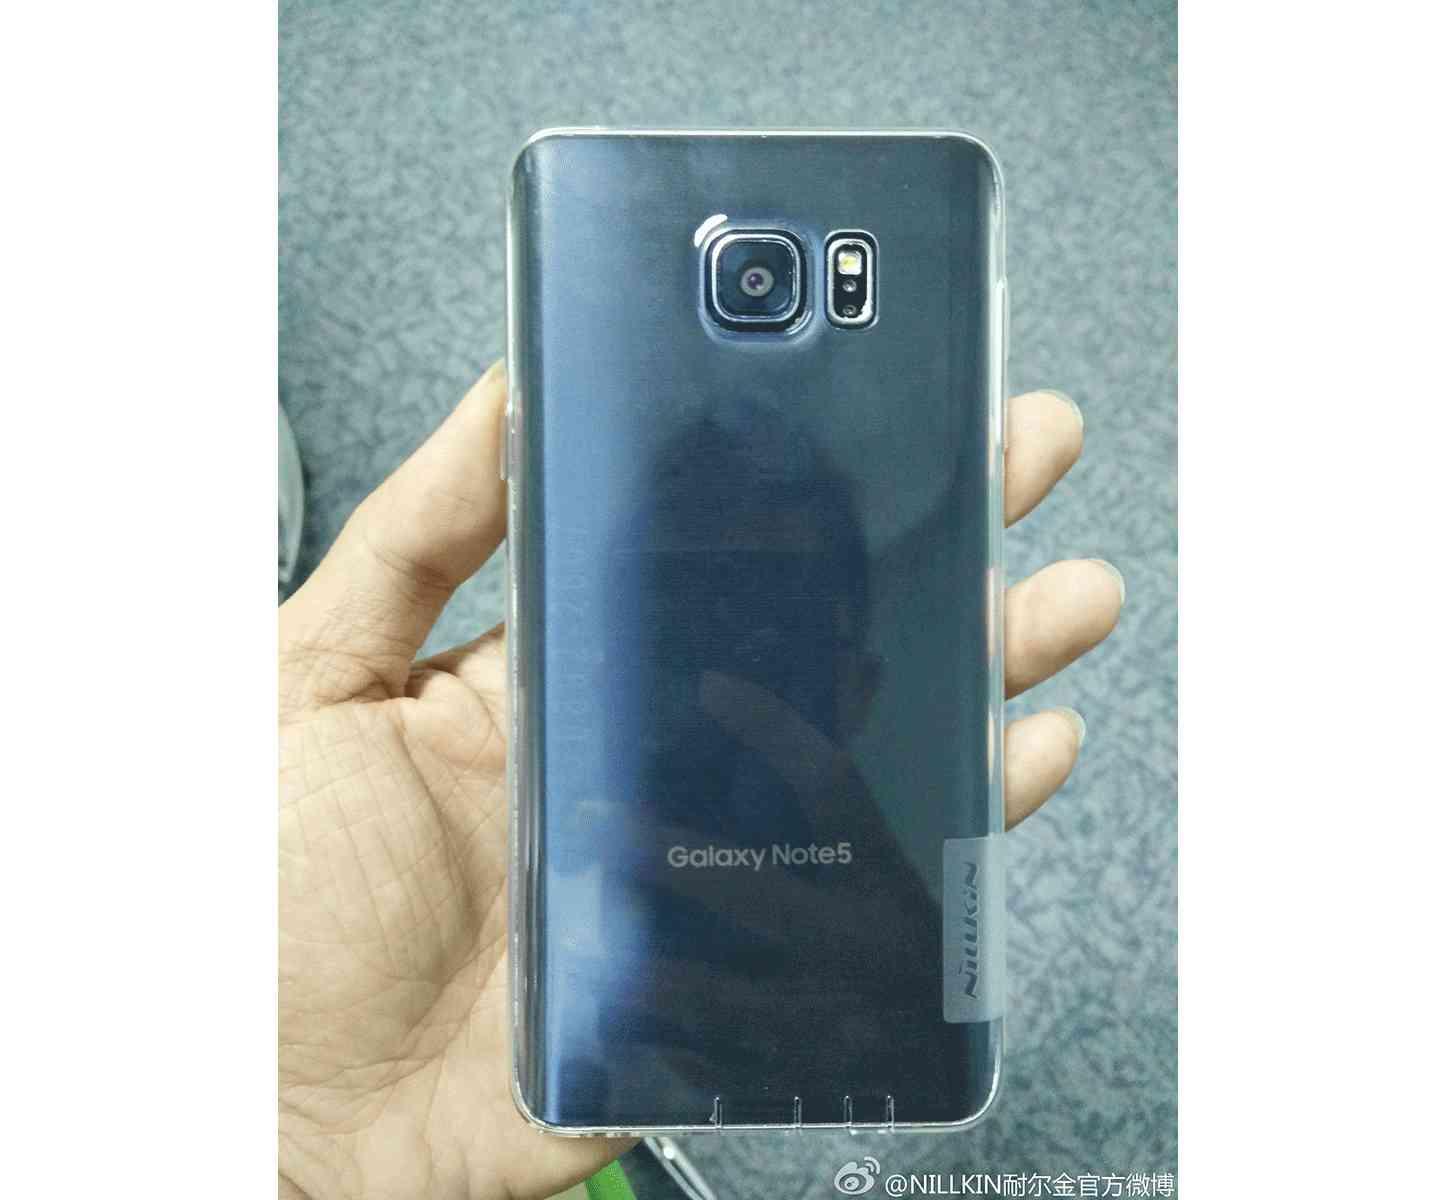 Samsung Galaxy Note 5 rear leak large